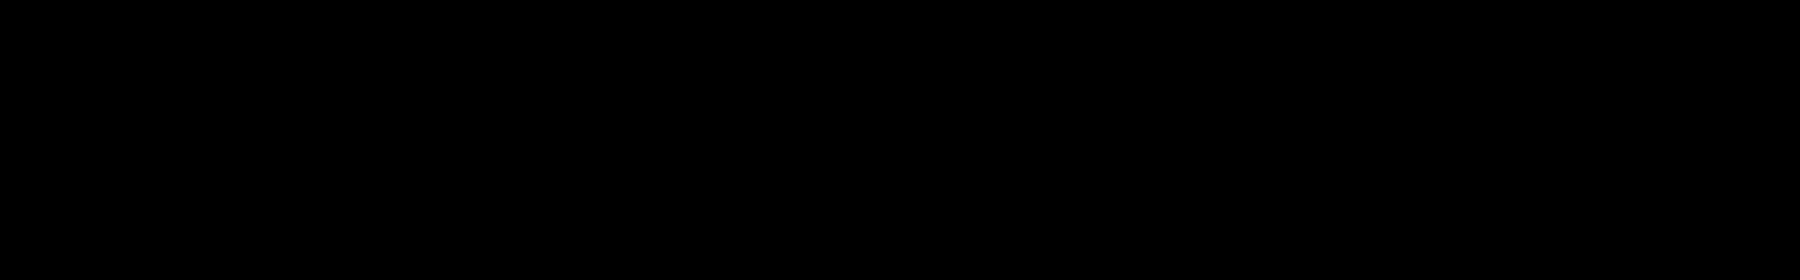 Artist Series - Gary Caos audio waveform